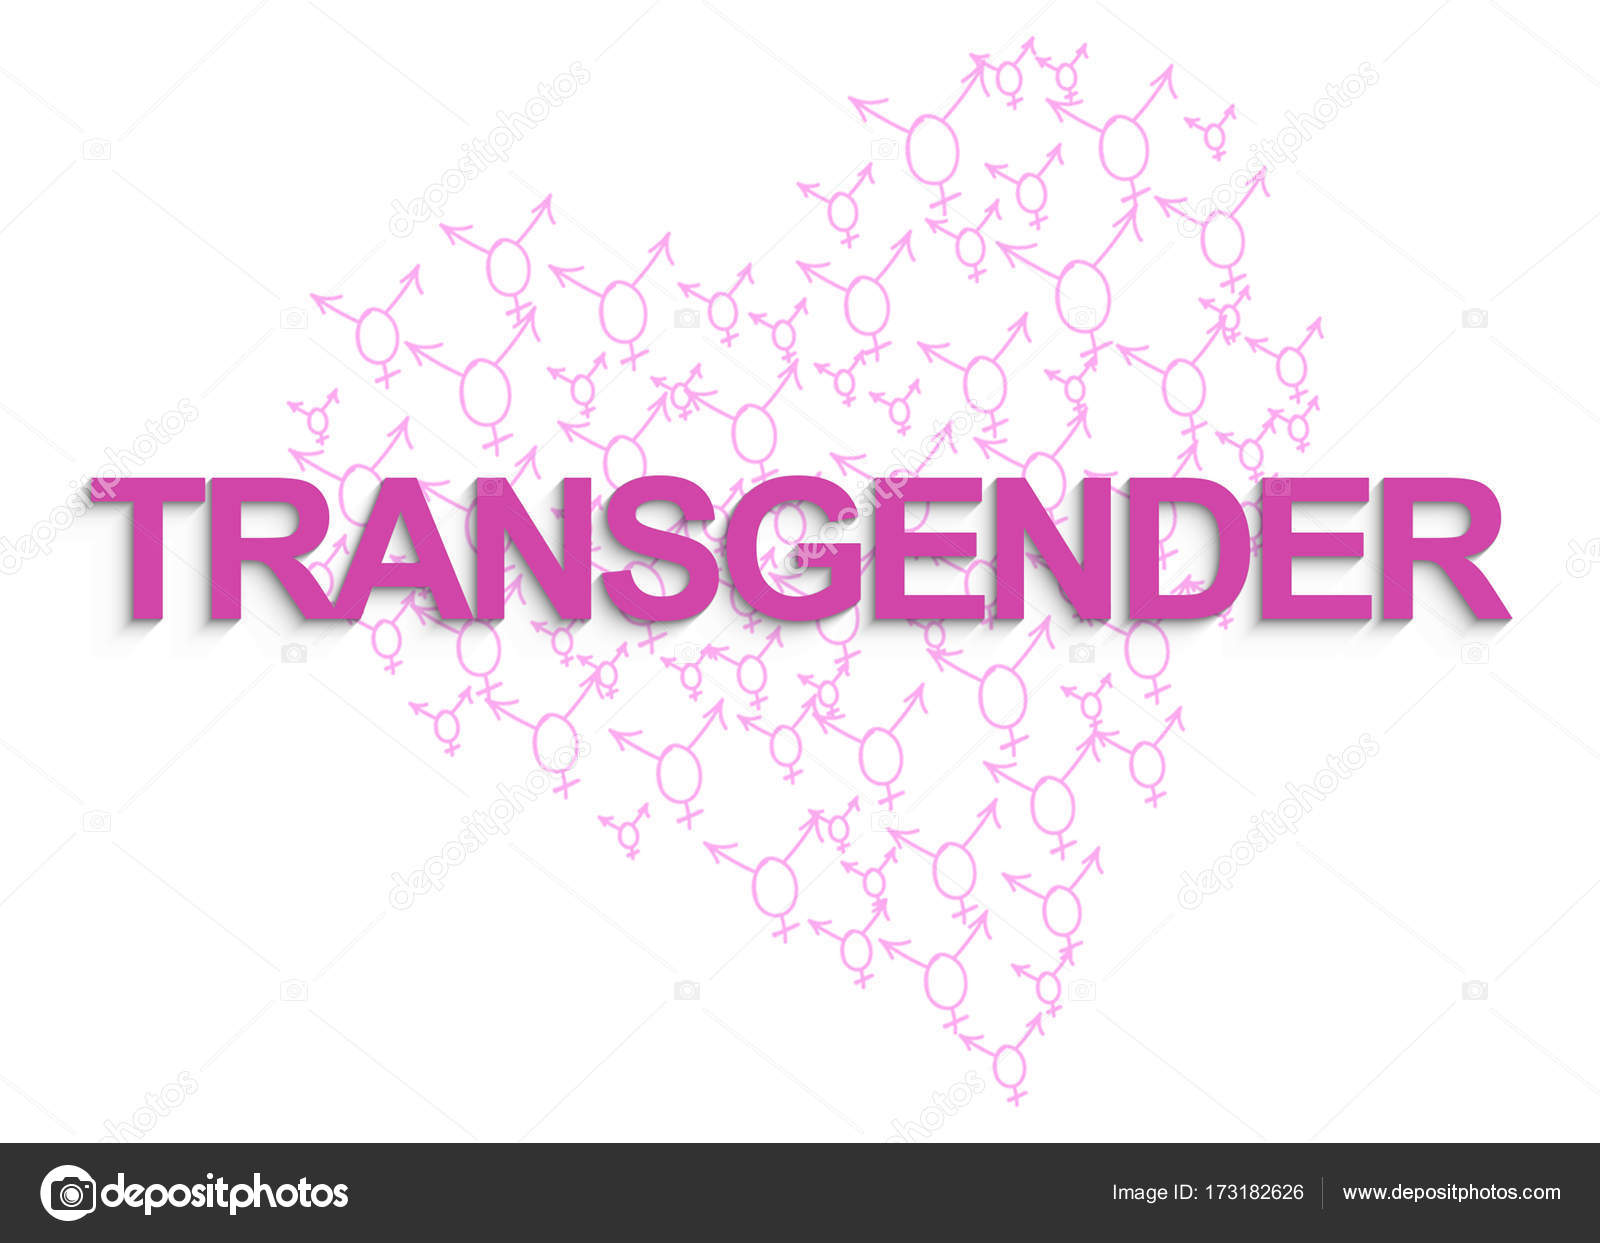 Transgender Text With Transgender Symbols On The Background Stock